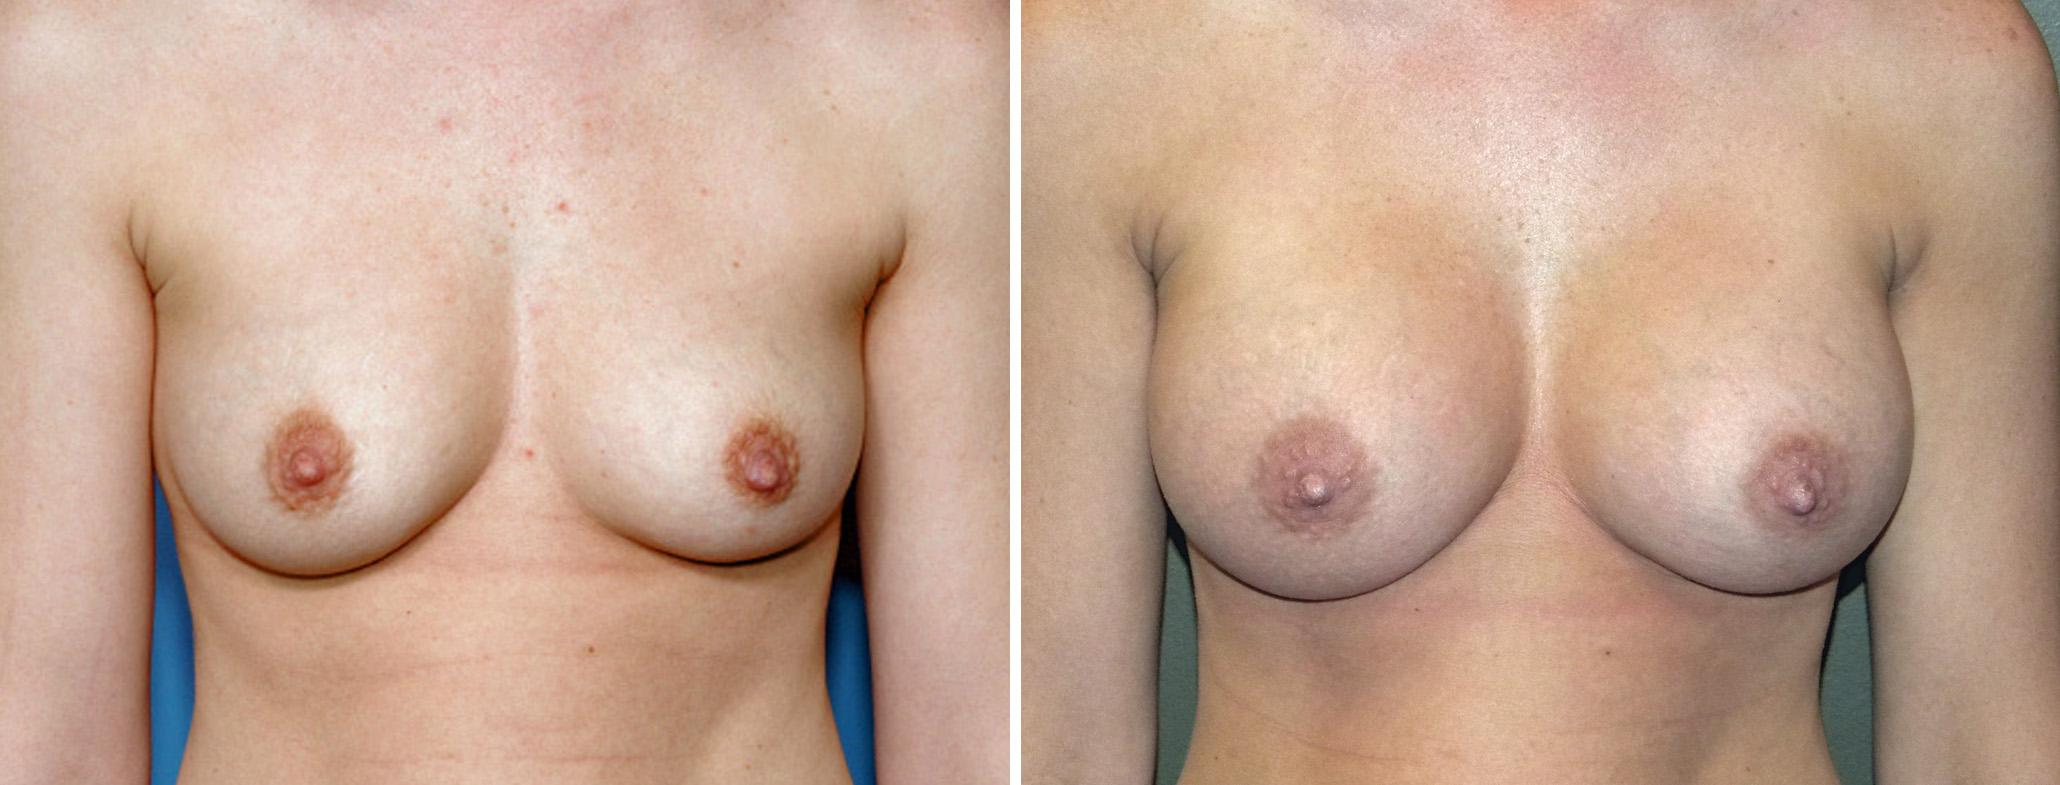 breast augmentation breast implants and breast e